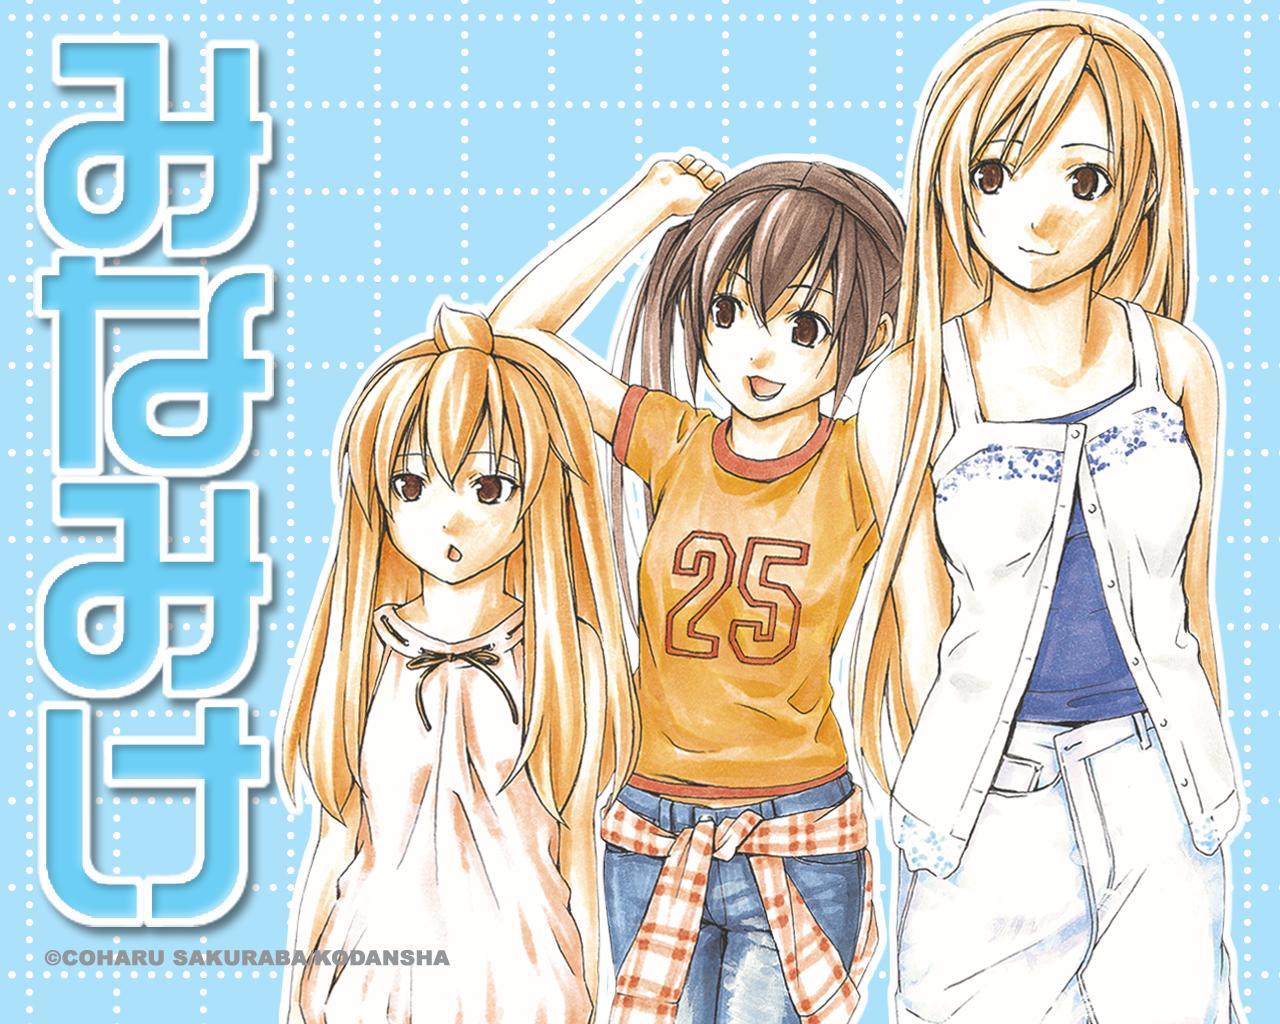 http://blog-imgs-45.fc2.com/a/n/k/ankosokuho/img_975521_7095917_0.jpg